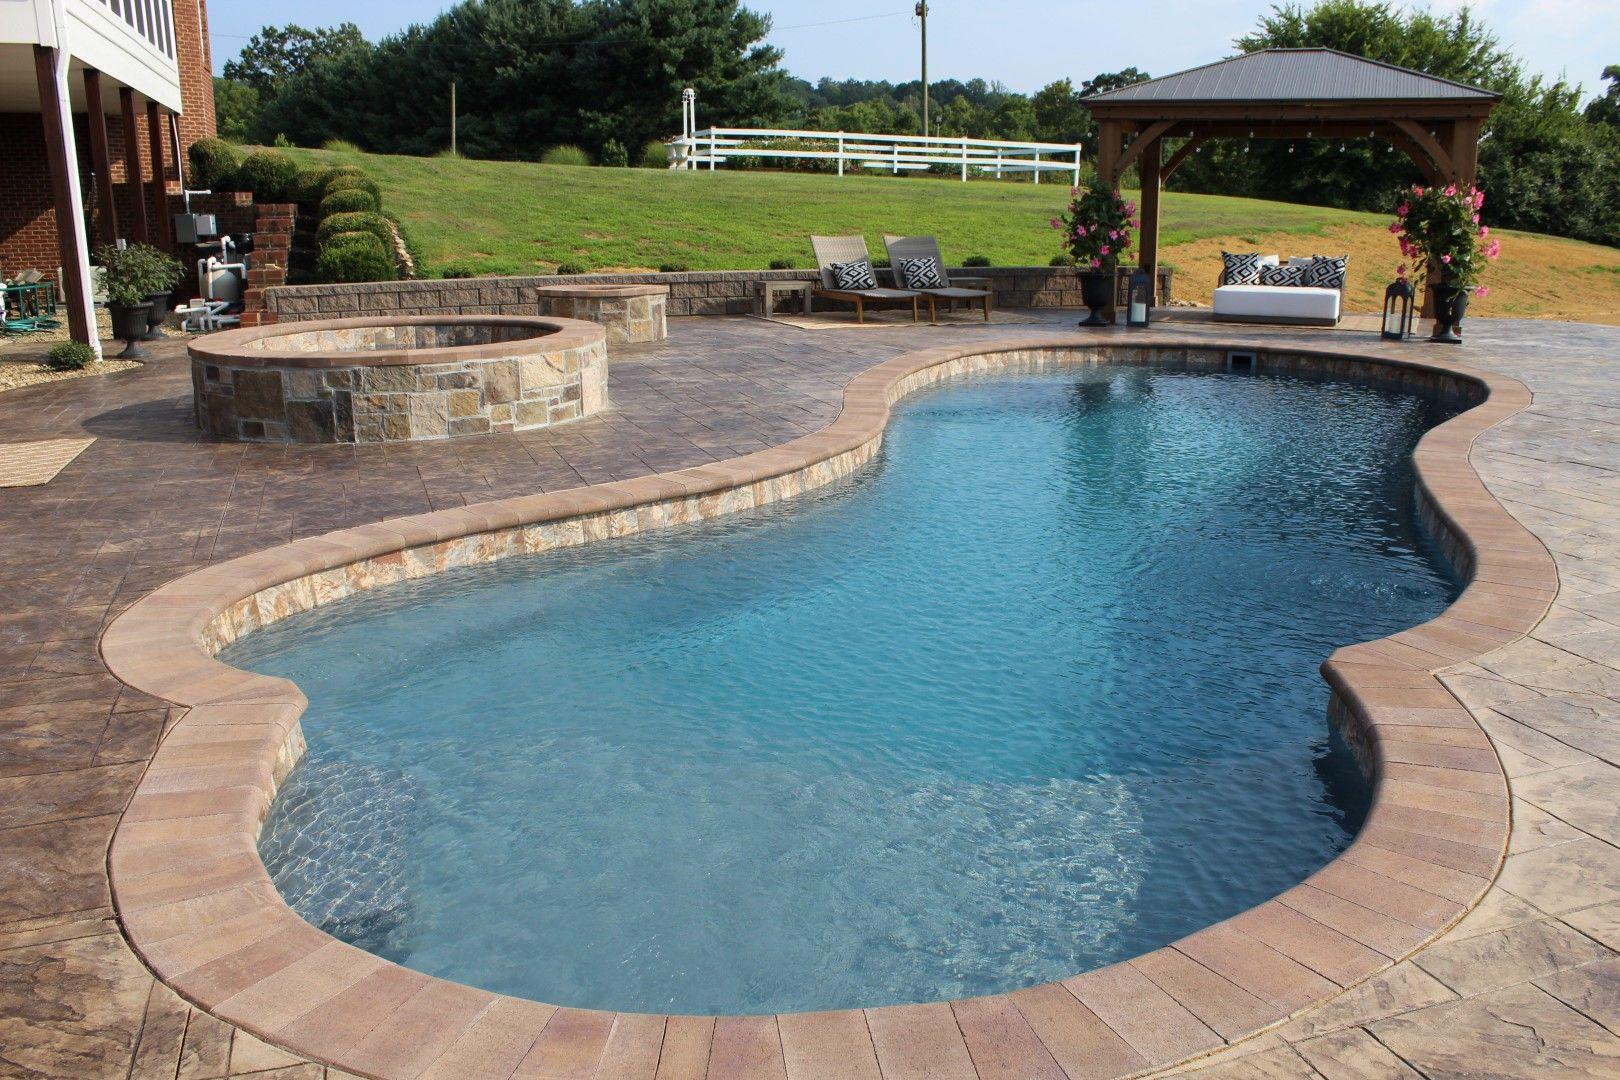 Leisure Pools offers the world's best composite fiberglass ...